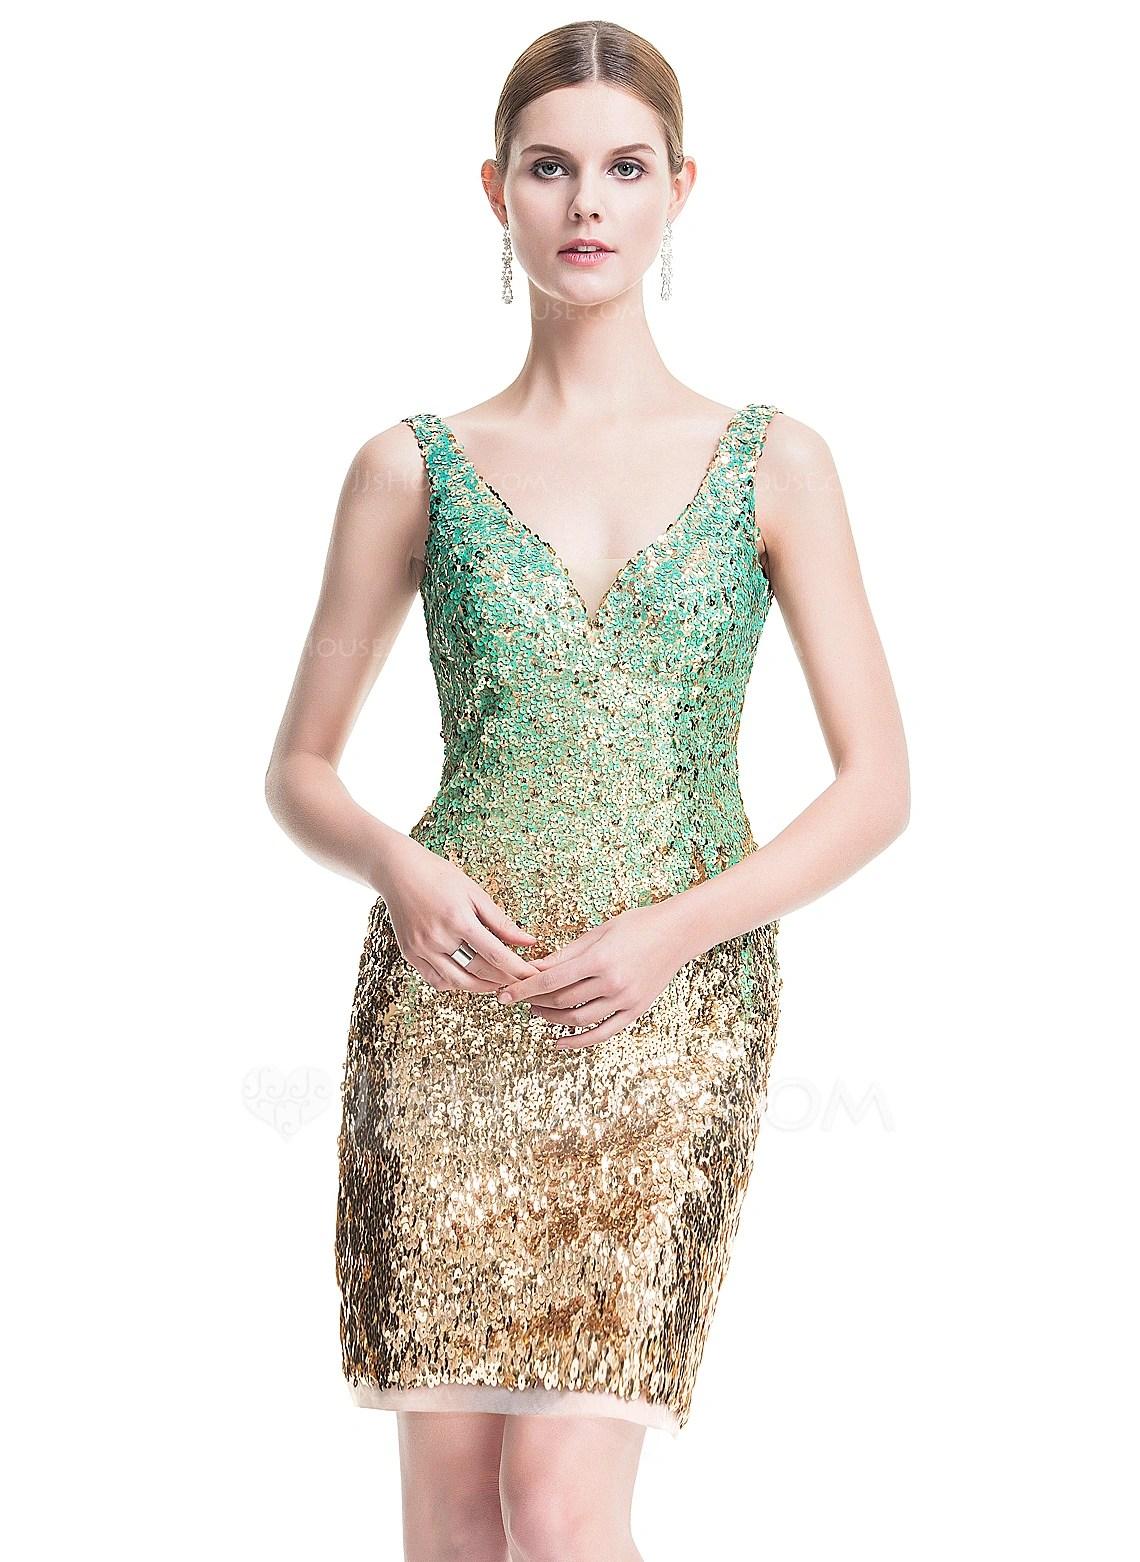 SheathColumn V Neck ShortMini Sequined Cocktail Dress